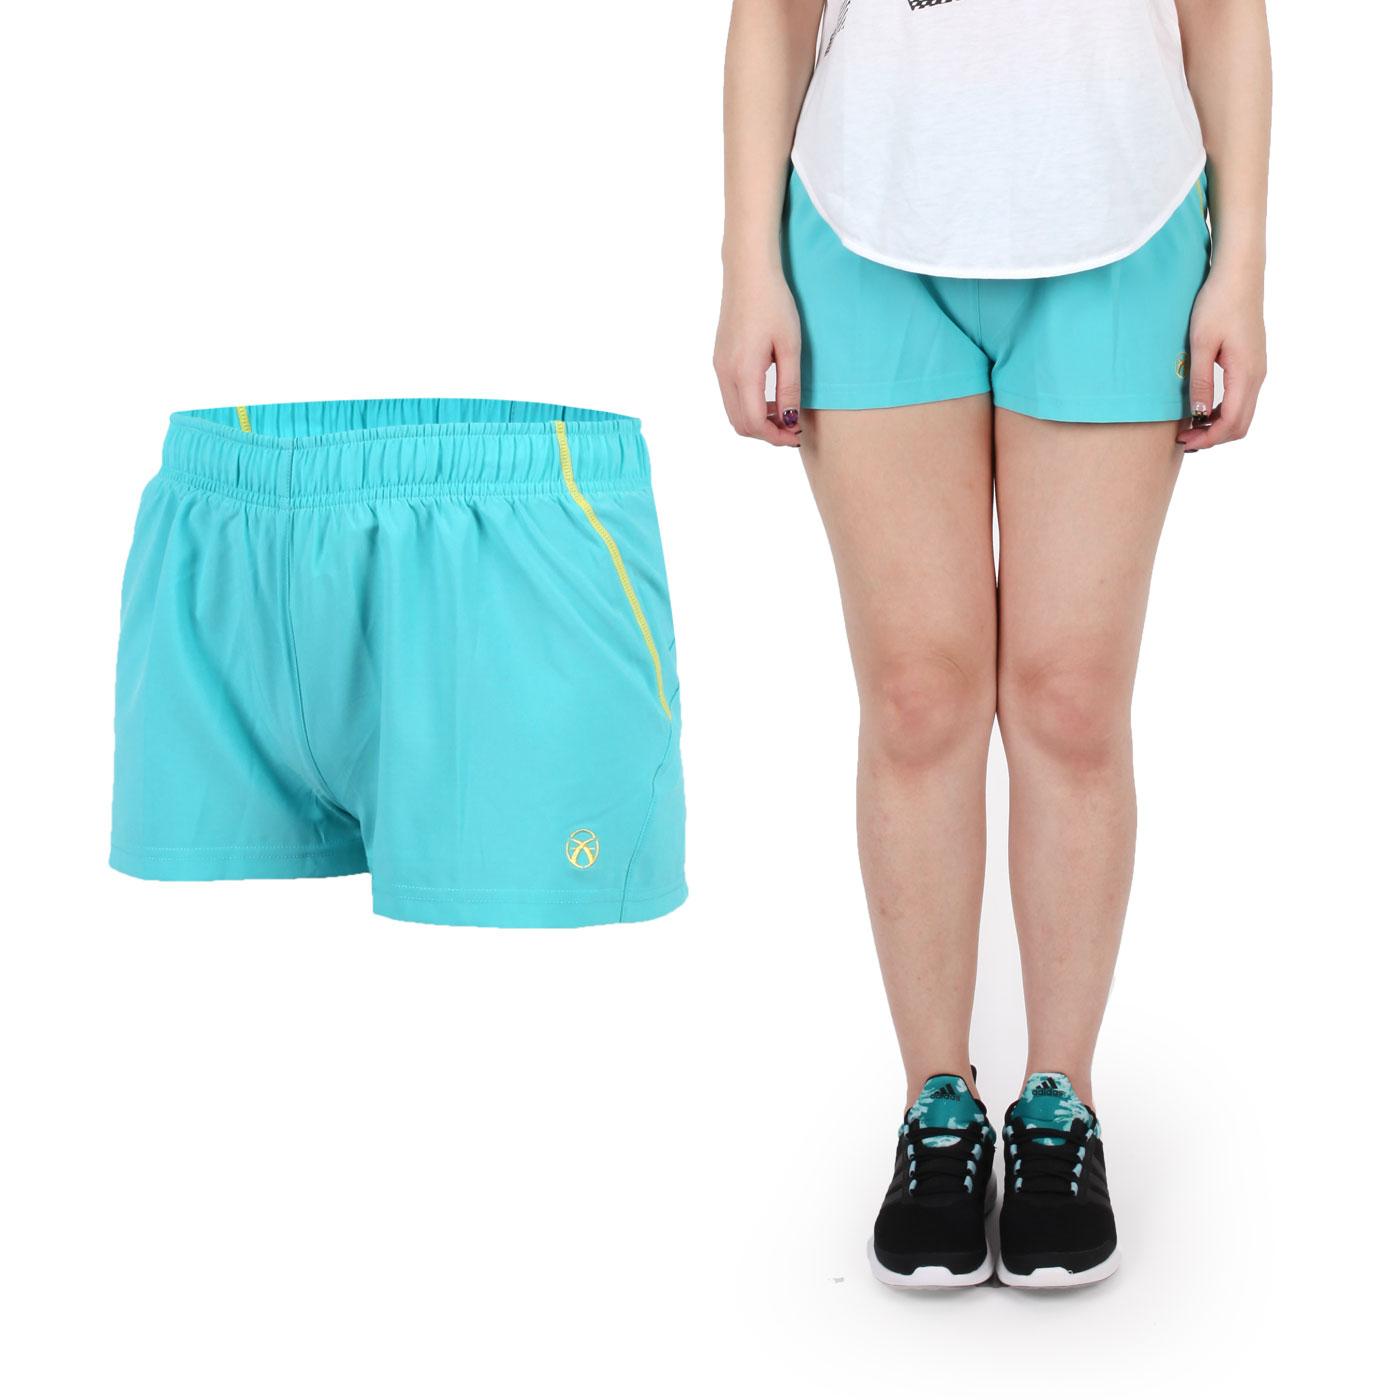 FIRESTAR 女慢跑短褲 CL623-10 - 湖水綠黃